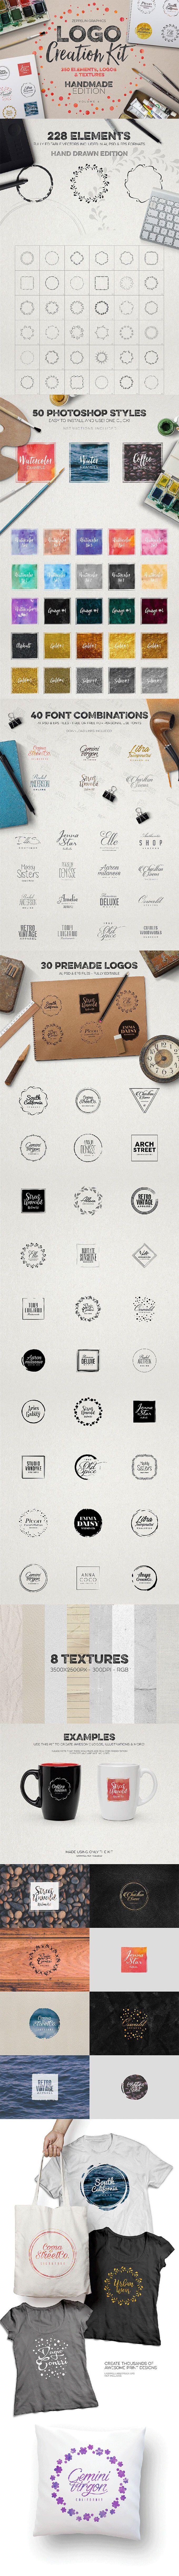 creative-designers-illustration-kit-19a